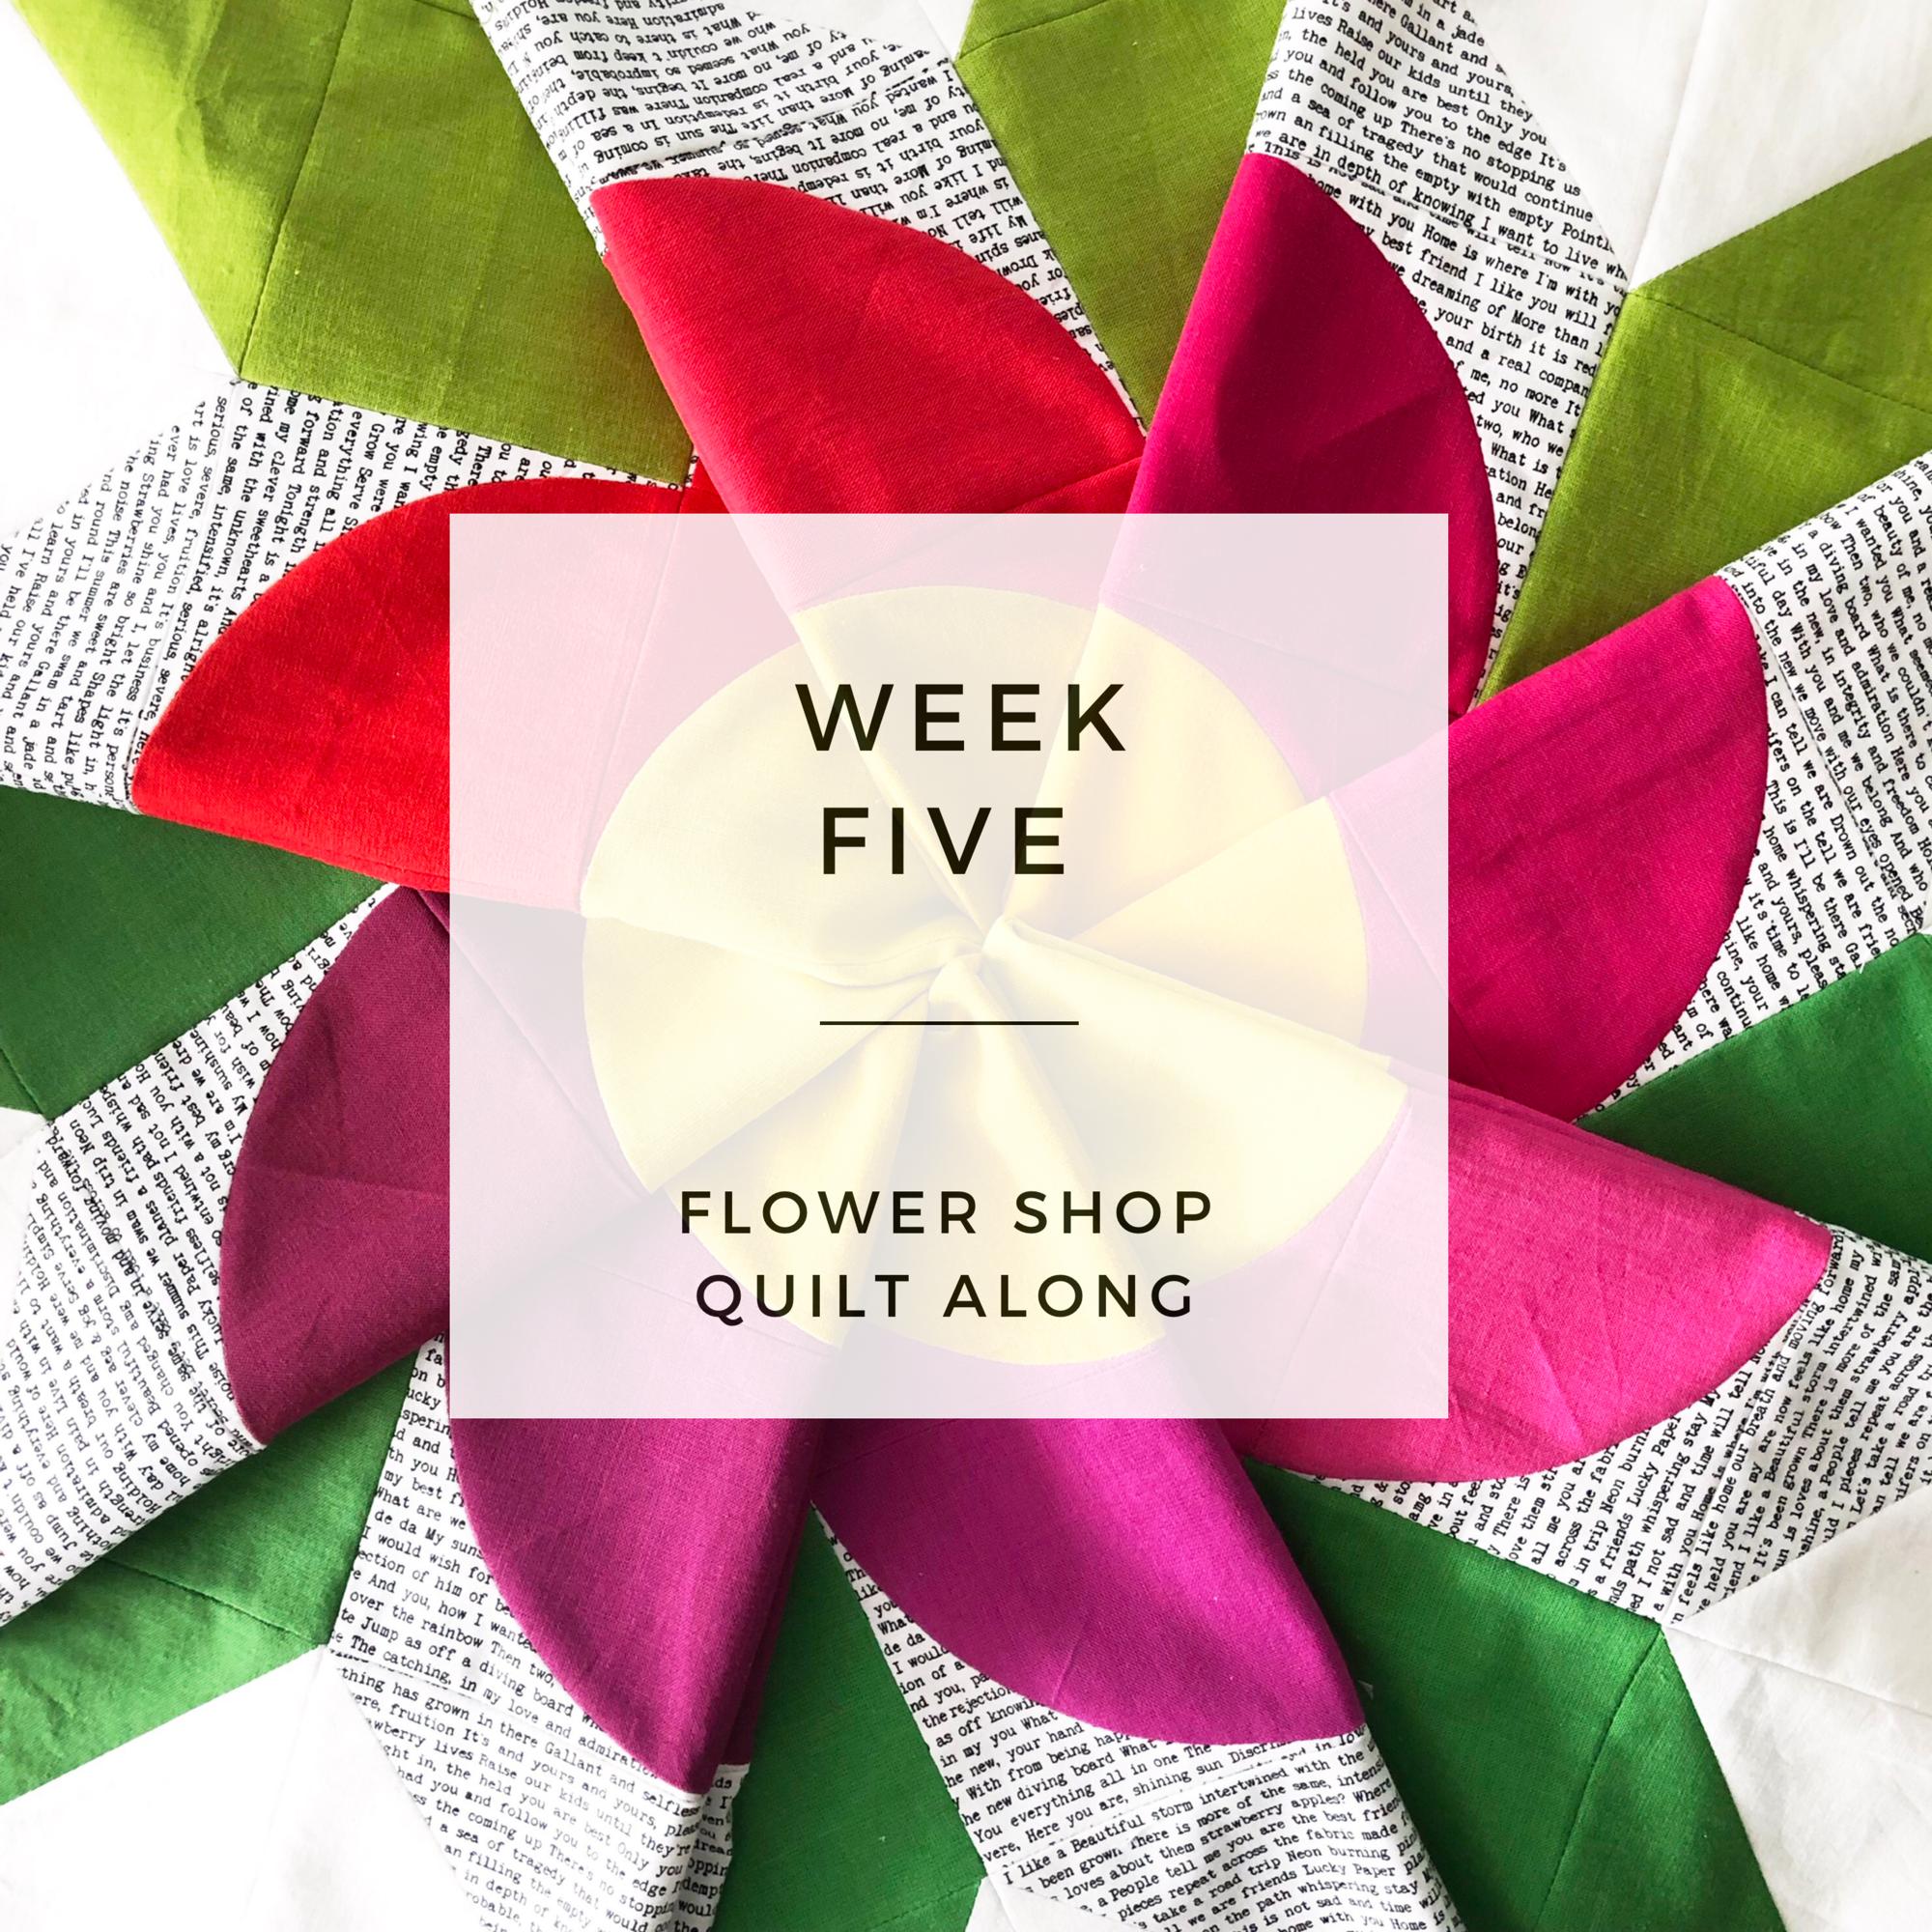 Flower Shop QAL - Week 5